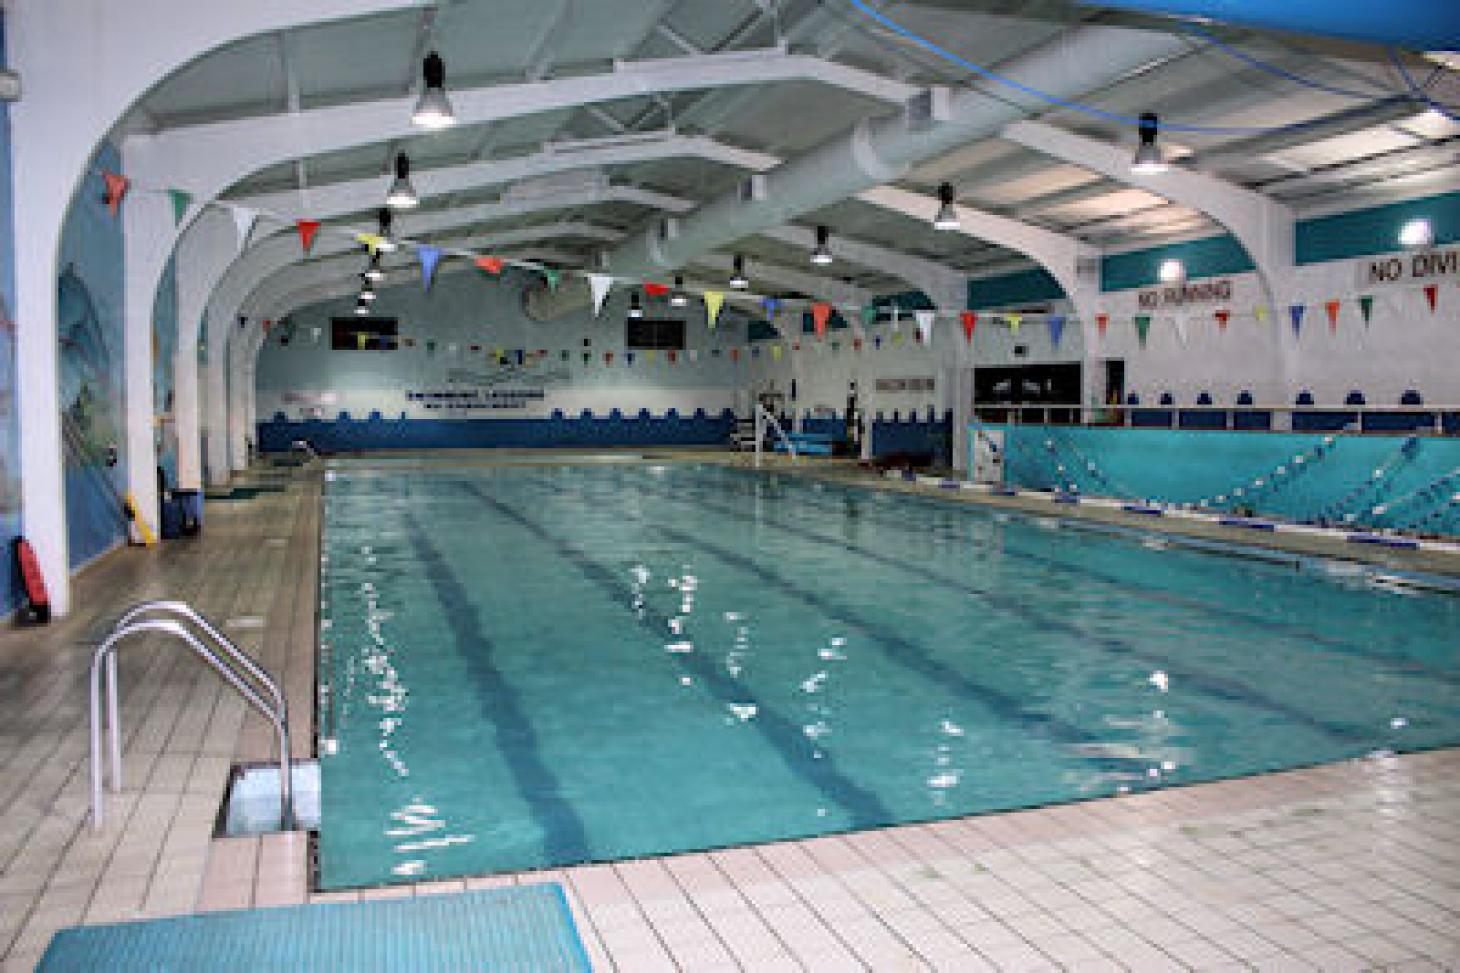 dlr Monkstown Indoor swimming pool